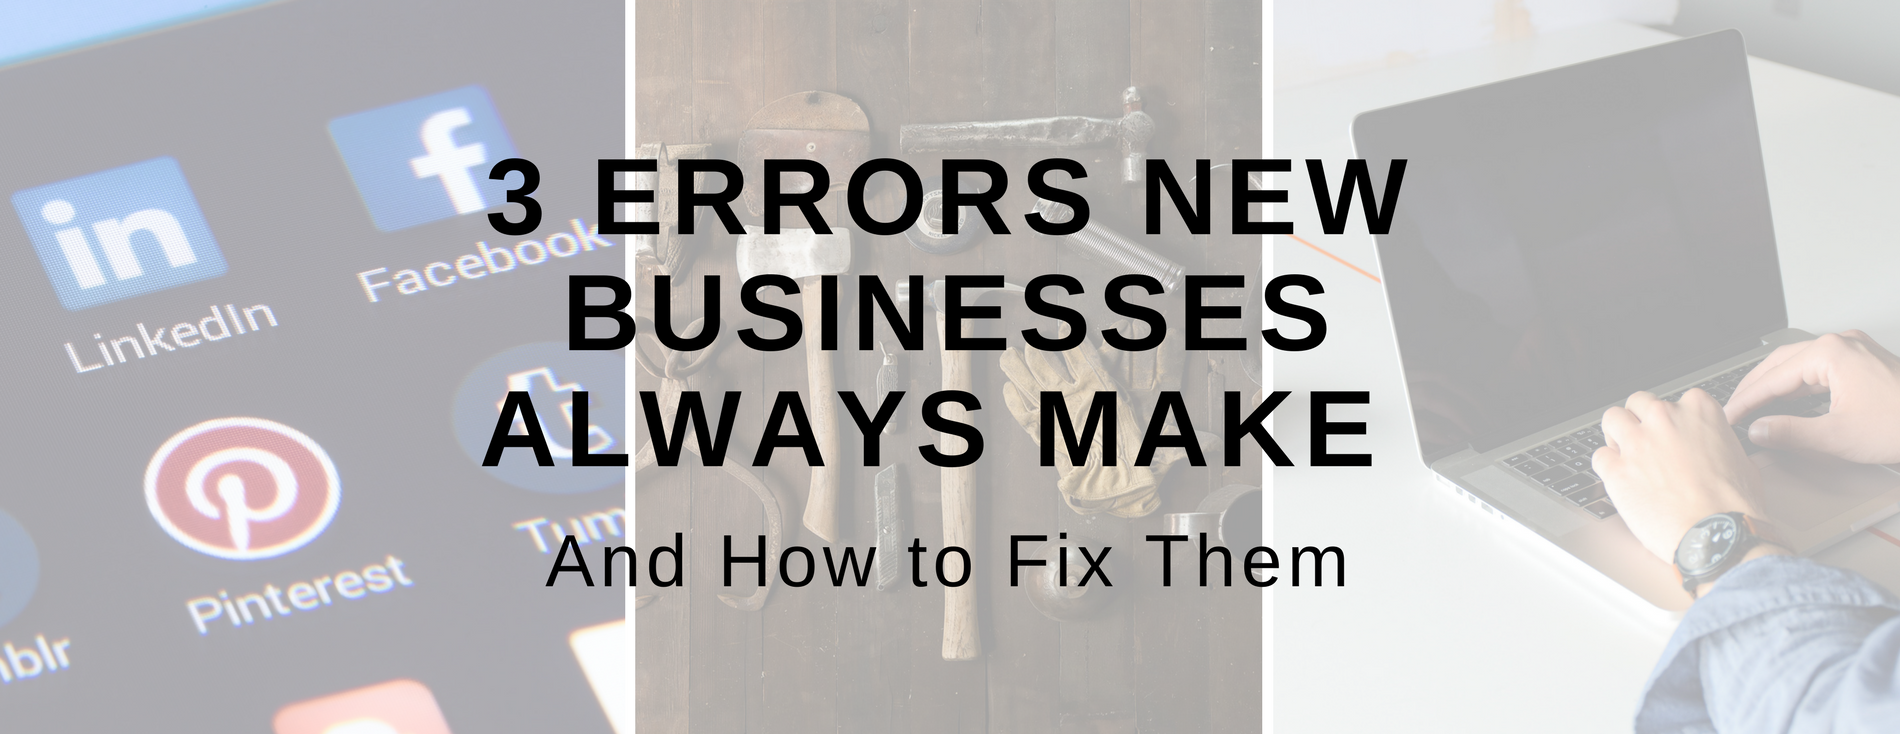 3 Errors New Businesses Always Make